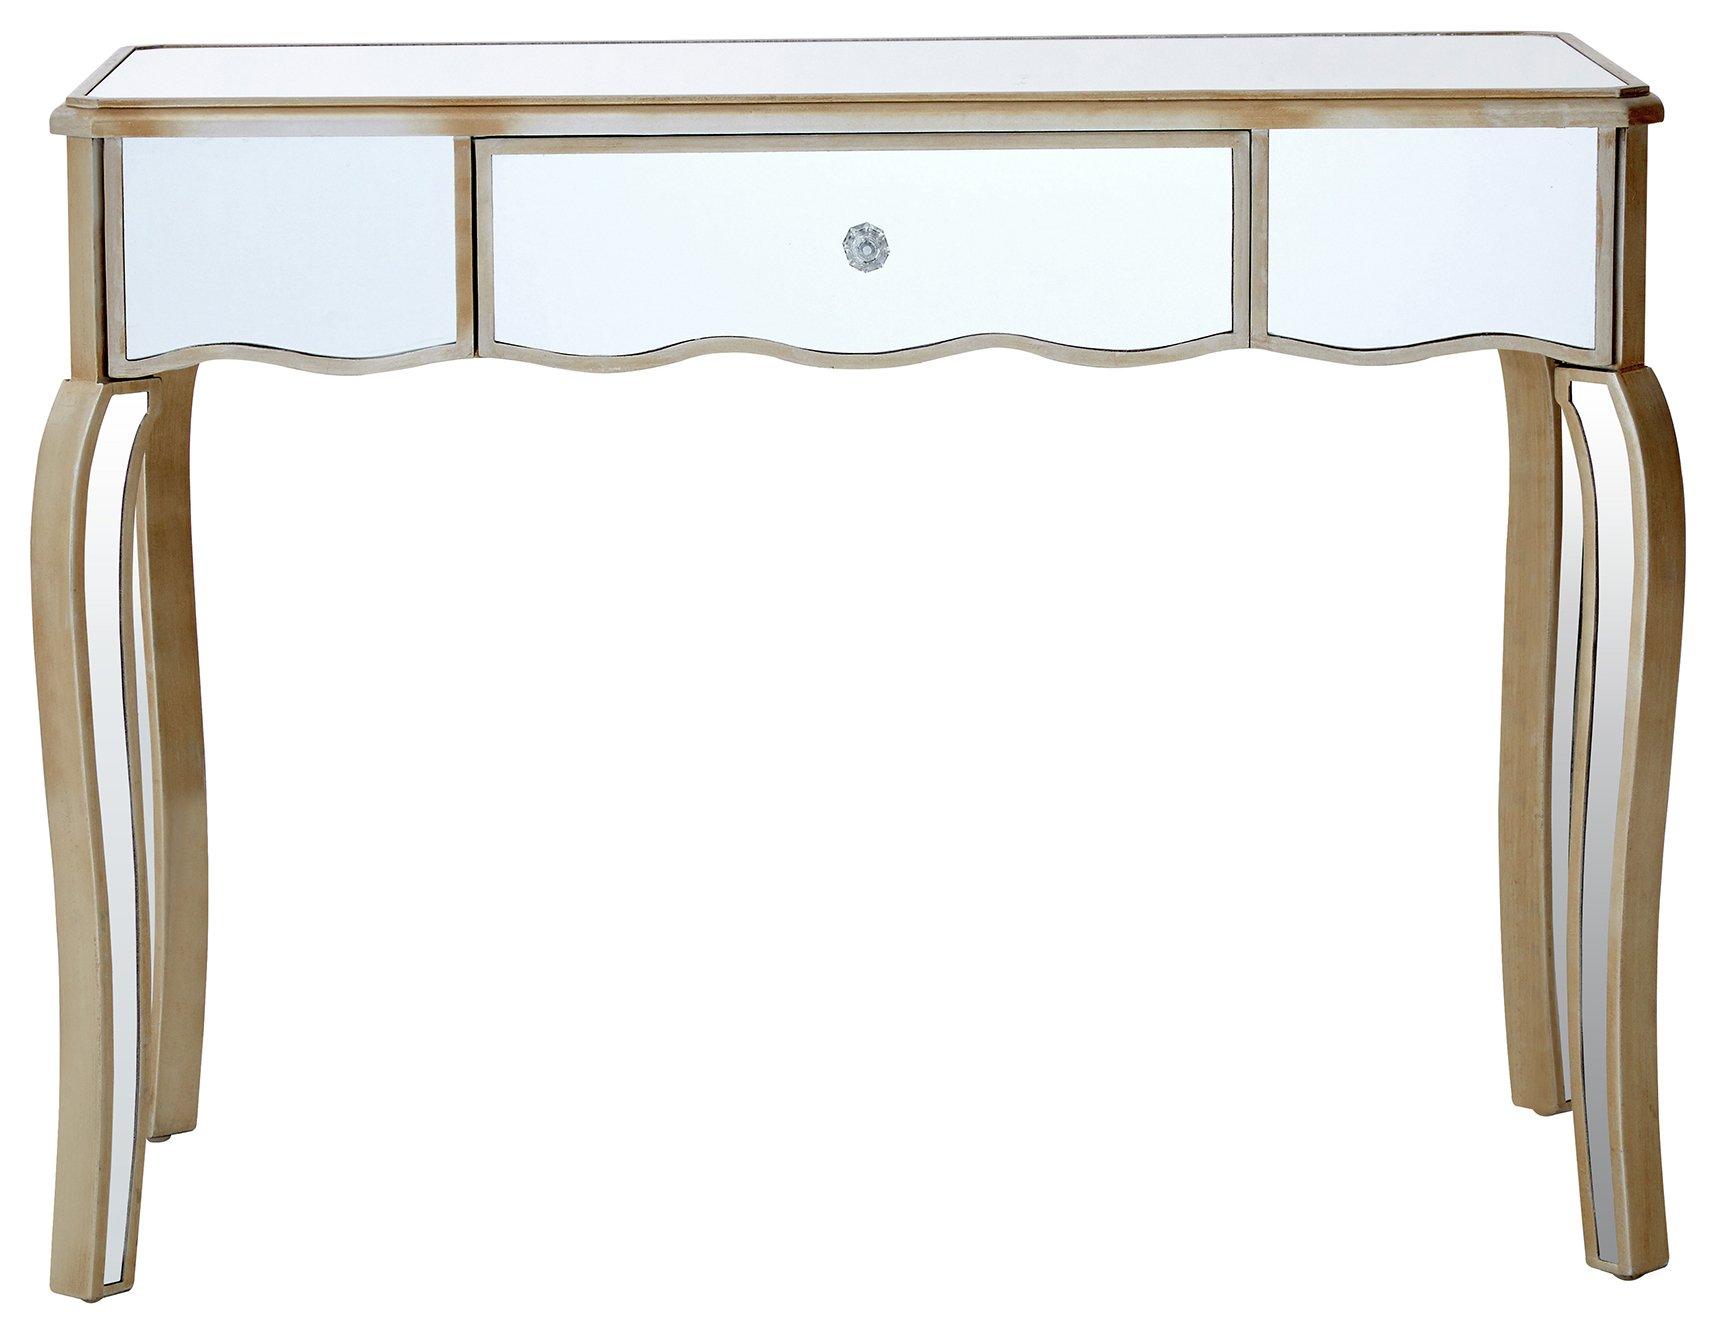 Premier Housewares Tiffany Mirror Finish Dressing Table